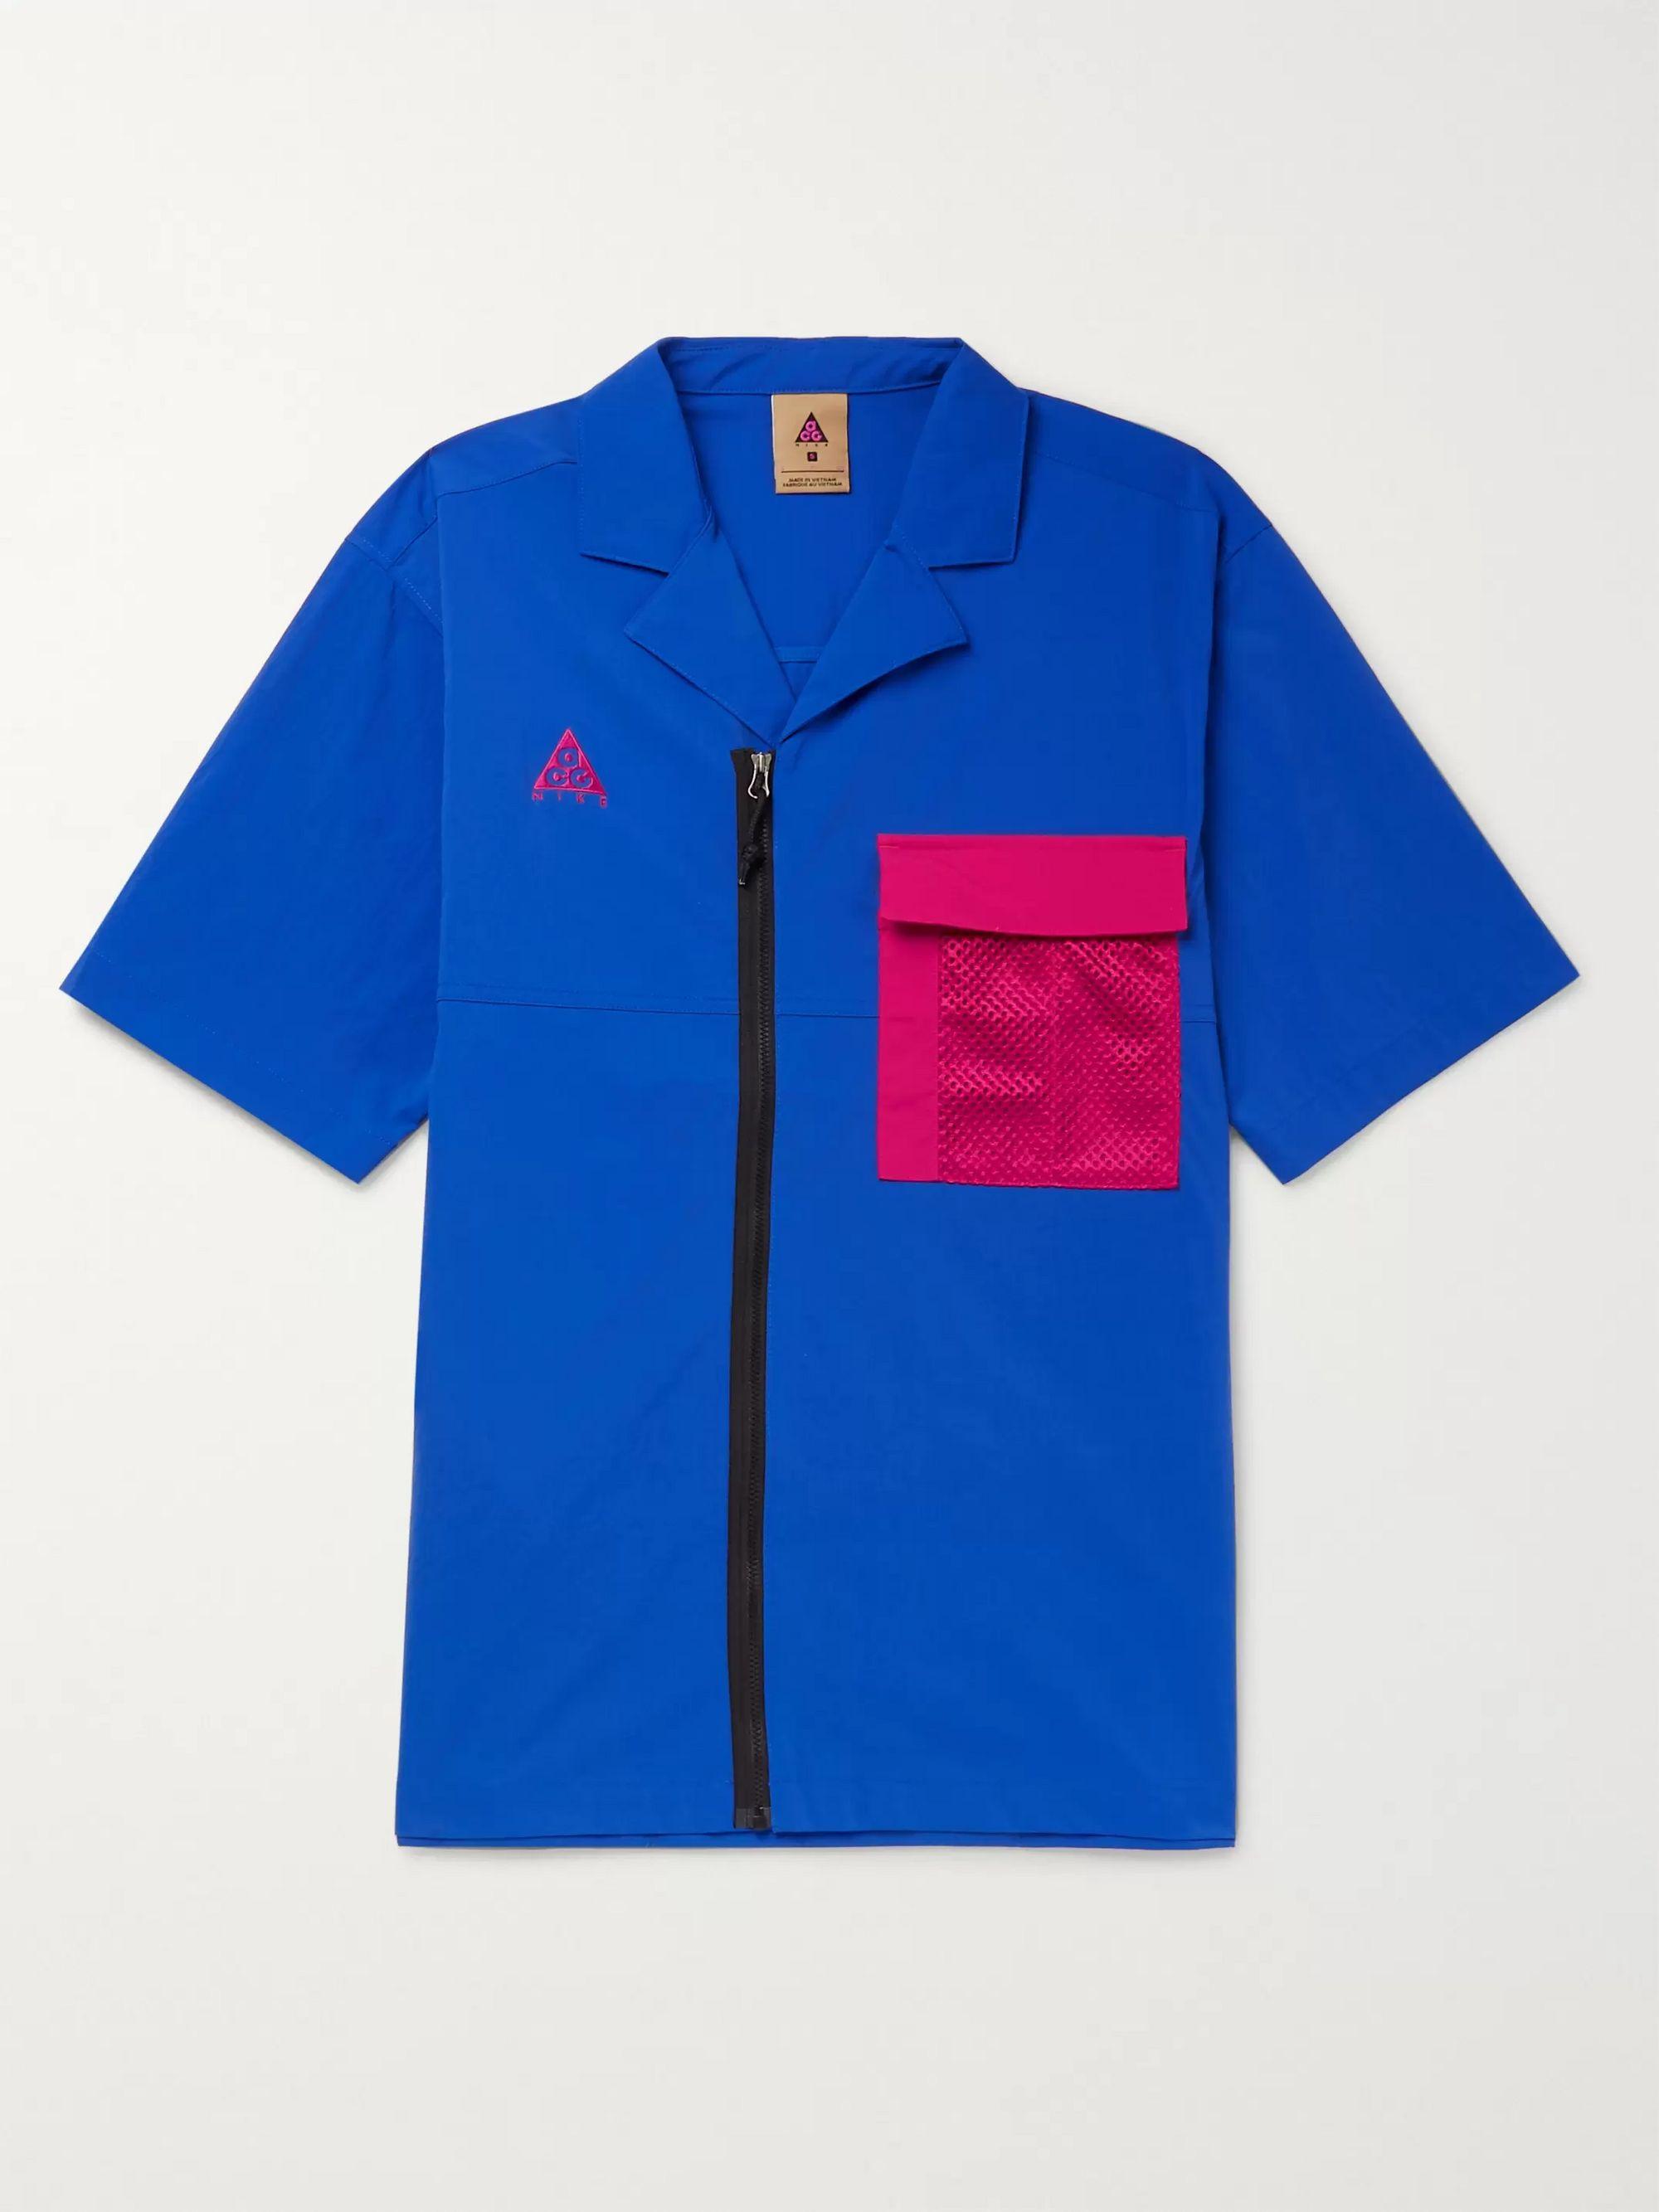 nike shirt with collar